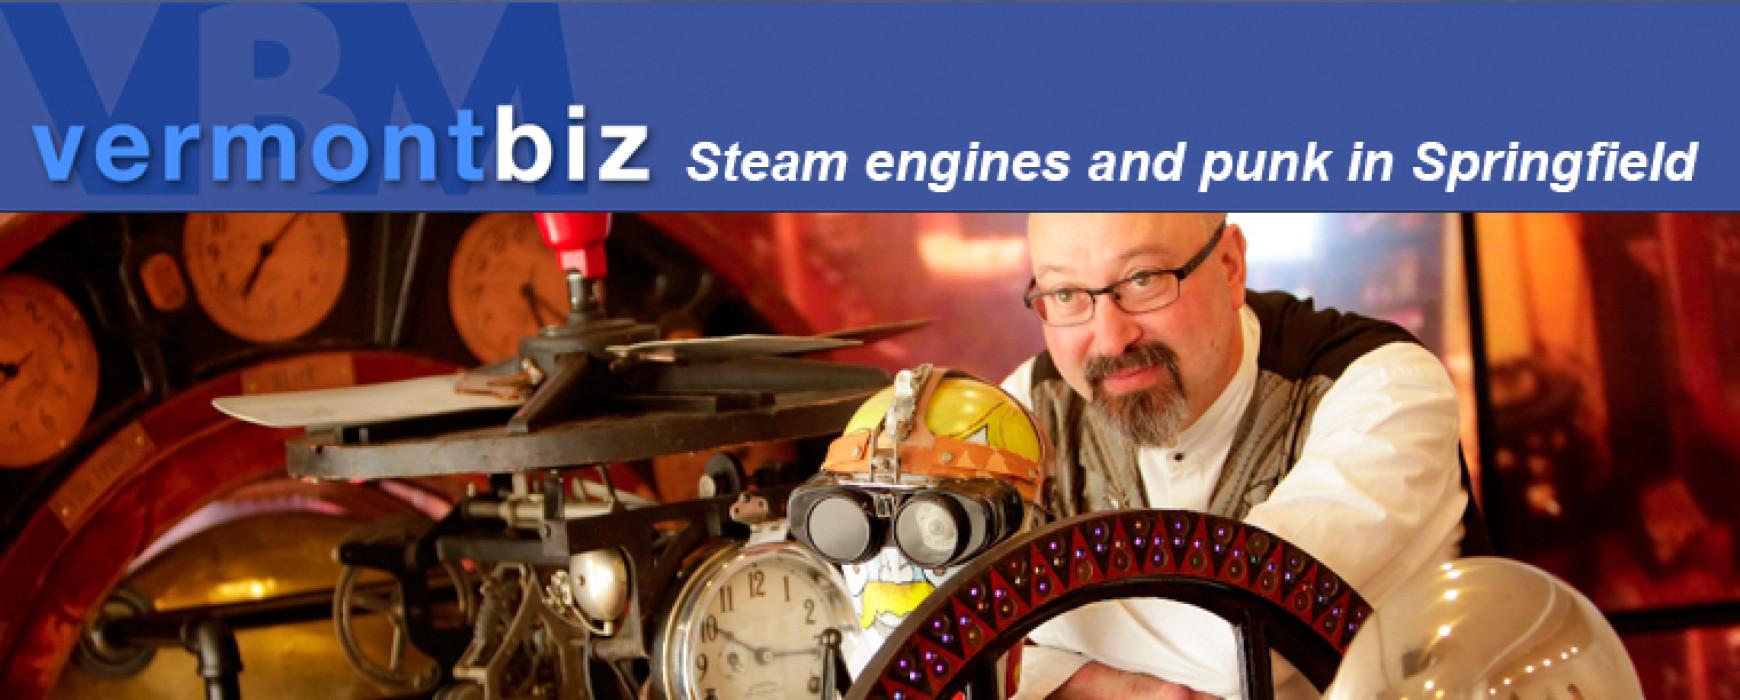 vermontbiz: Steam engines and punk in Springfield